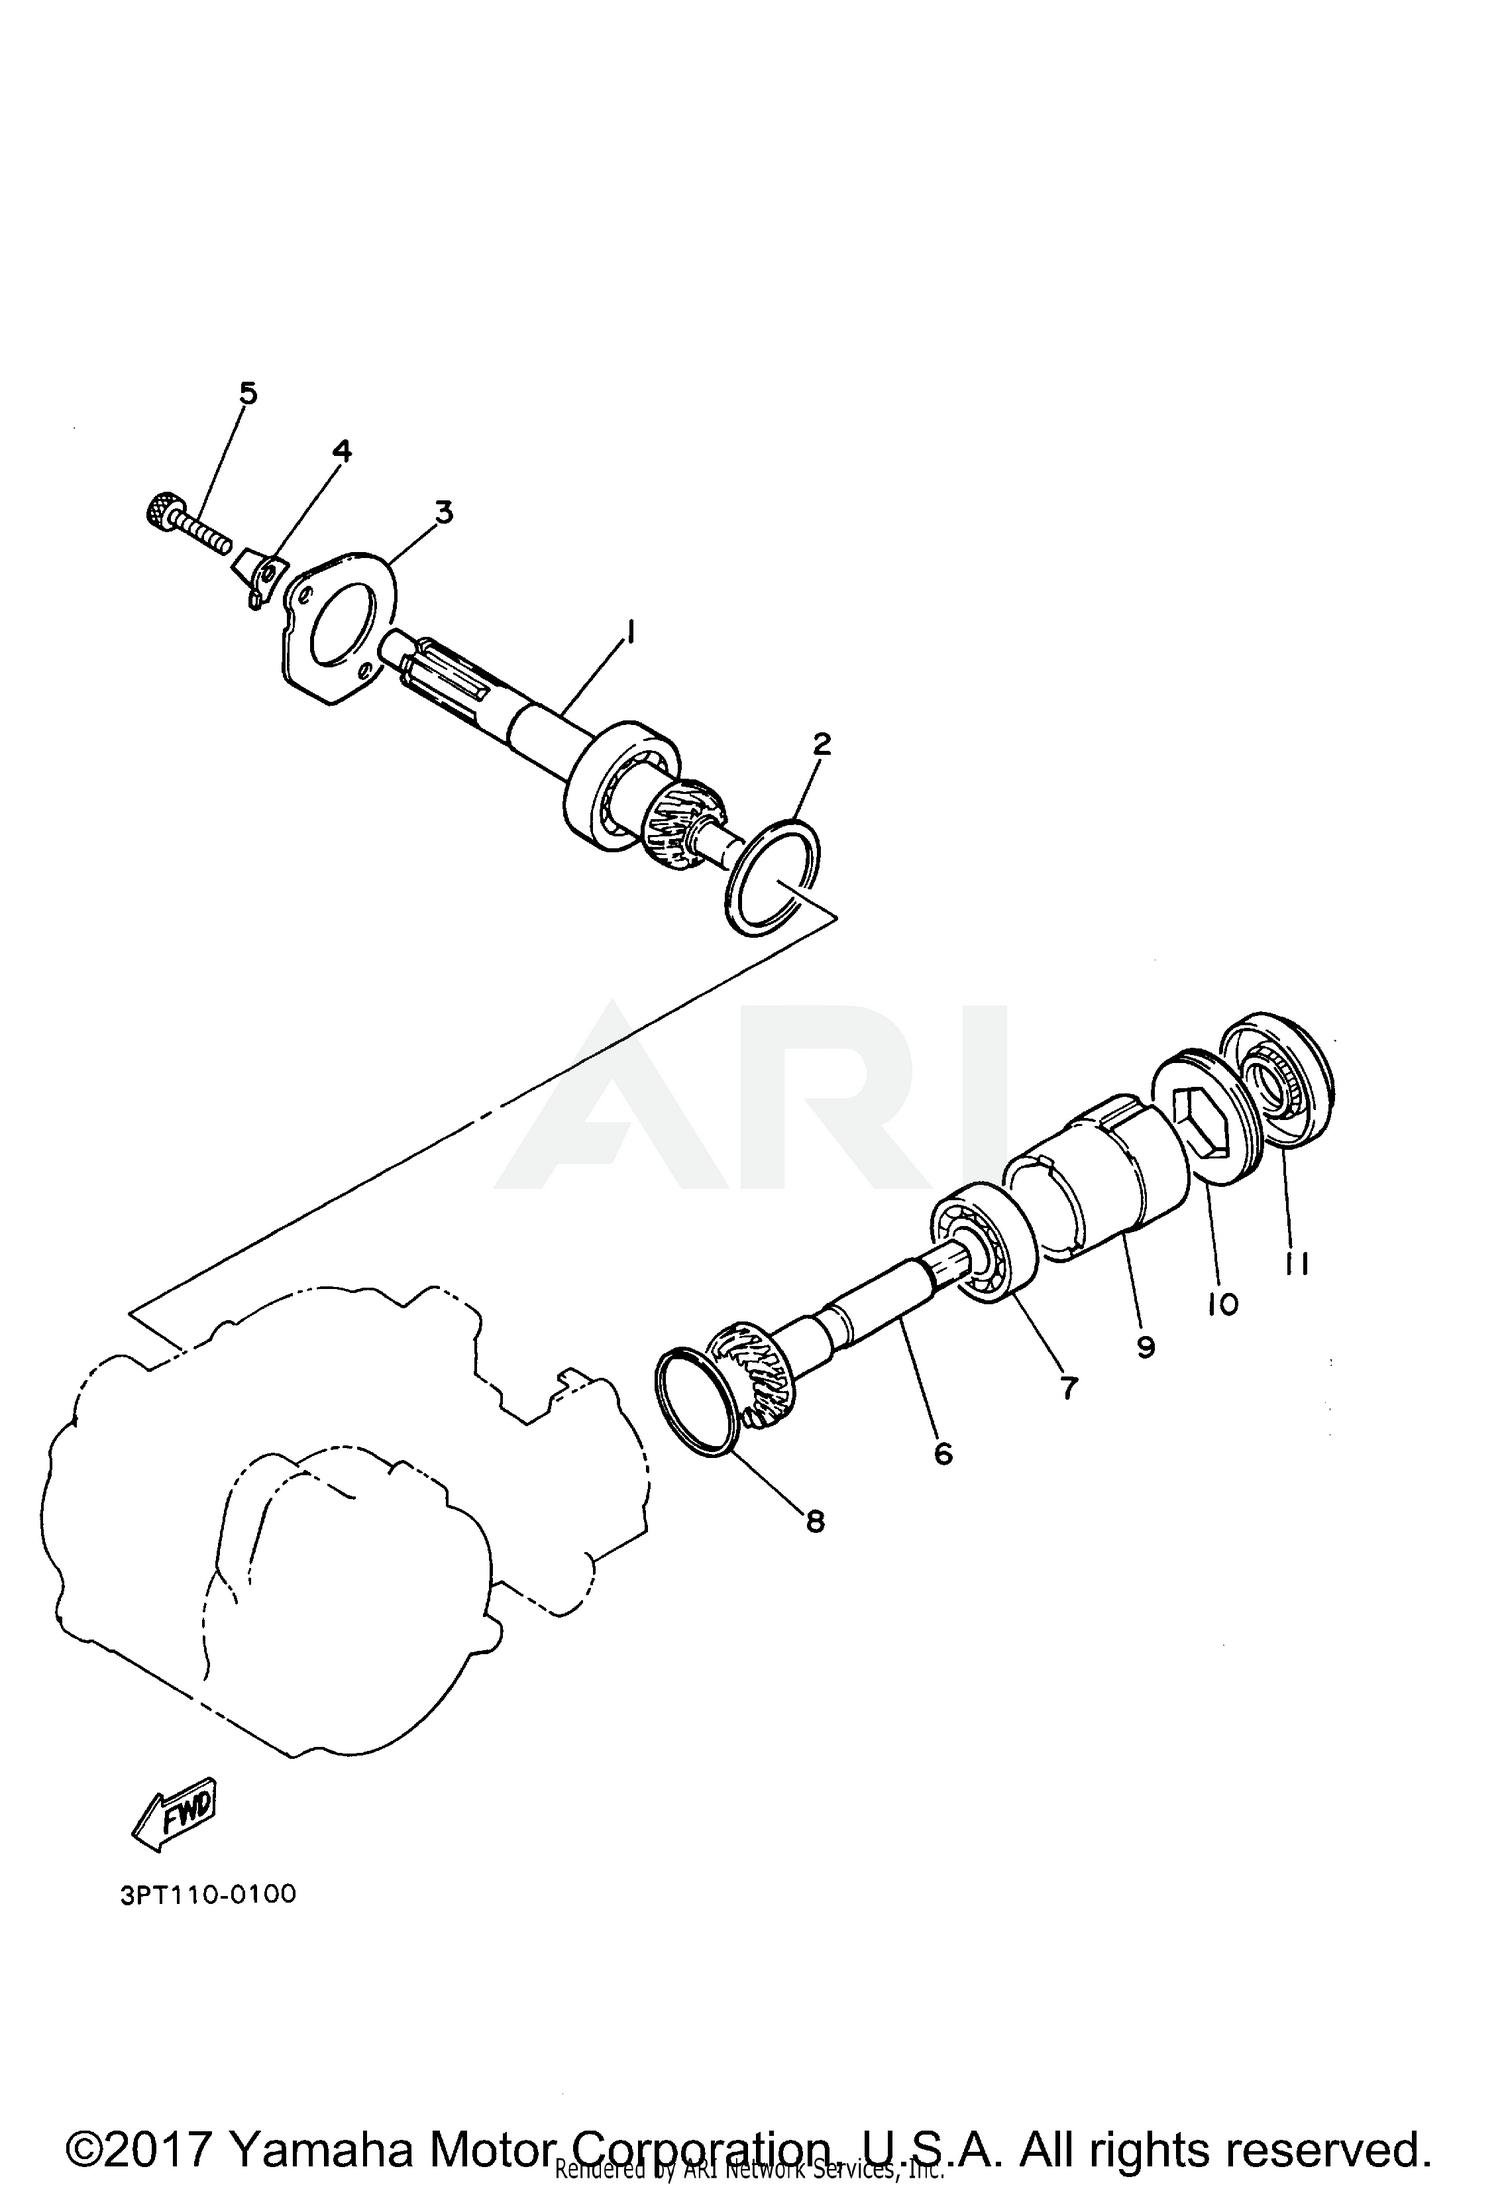 2018 Yamaha Pw50 Pw50j2 Transmission Parts Oem Diagram For Motorcycles